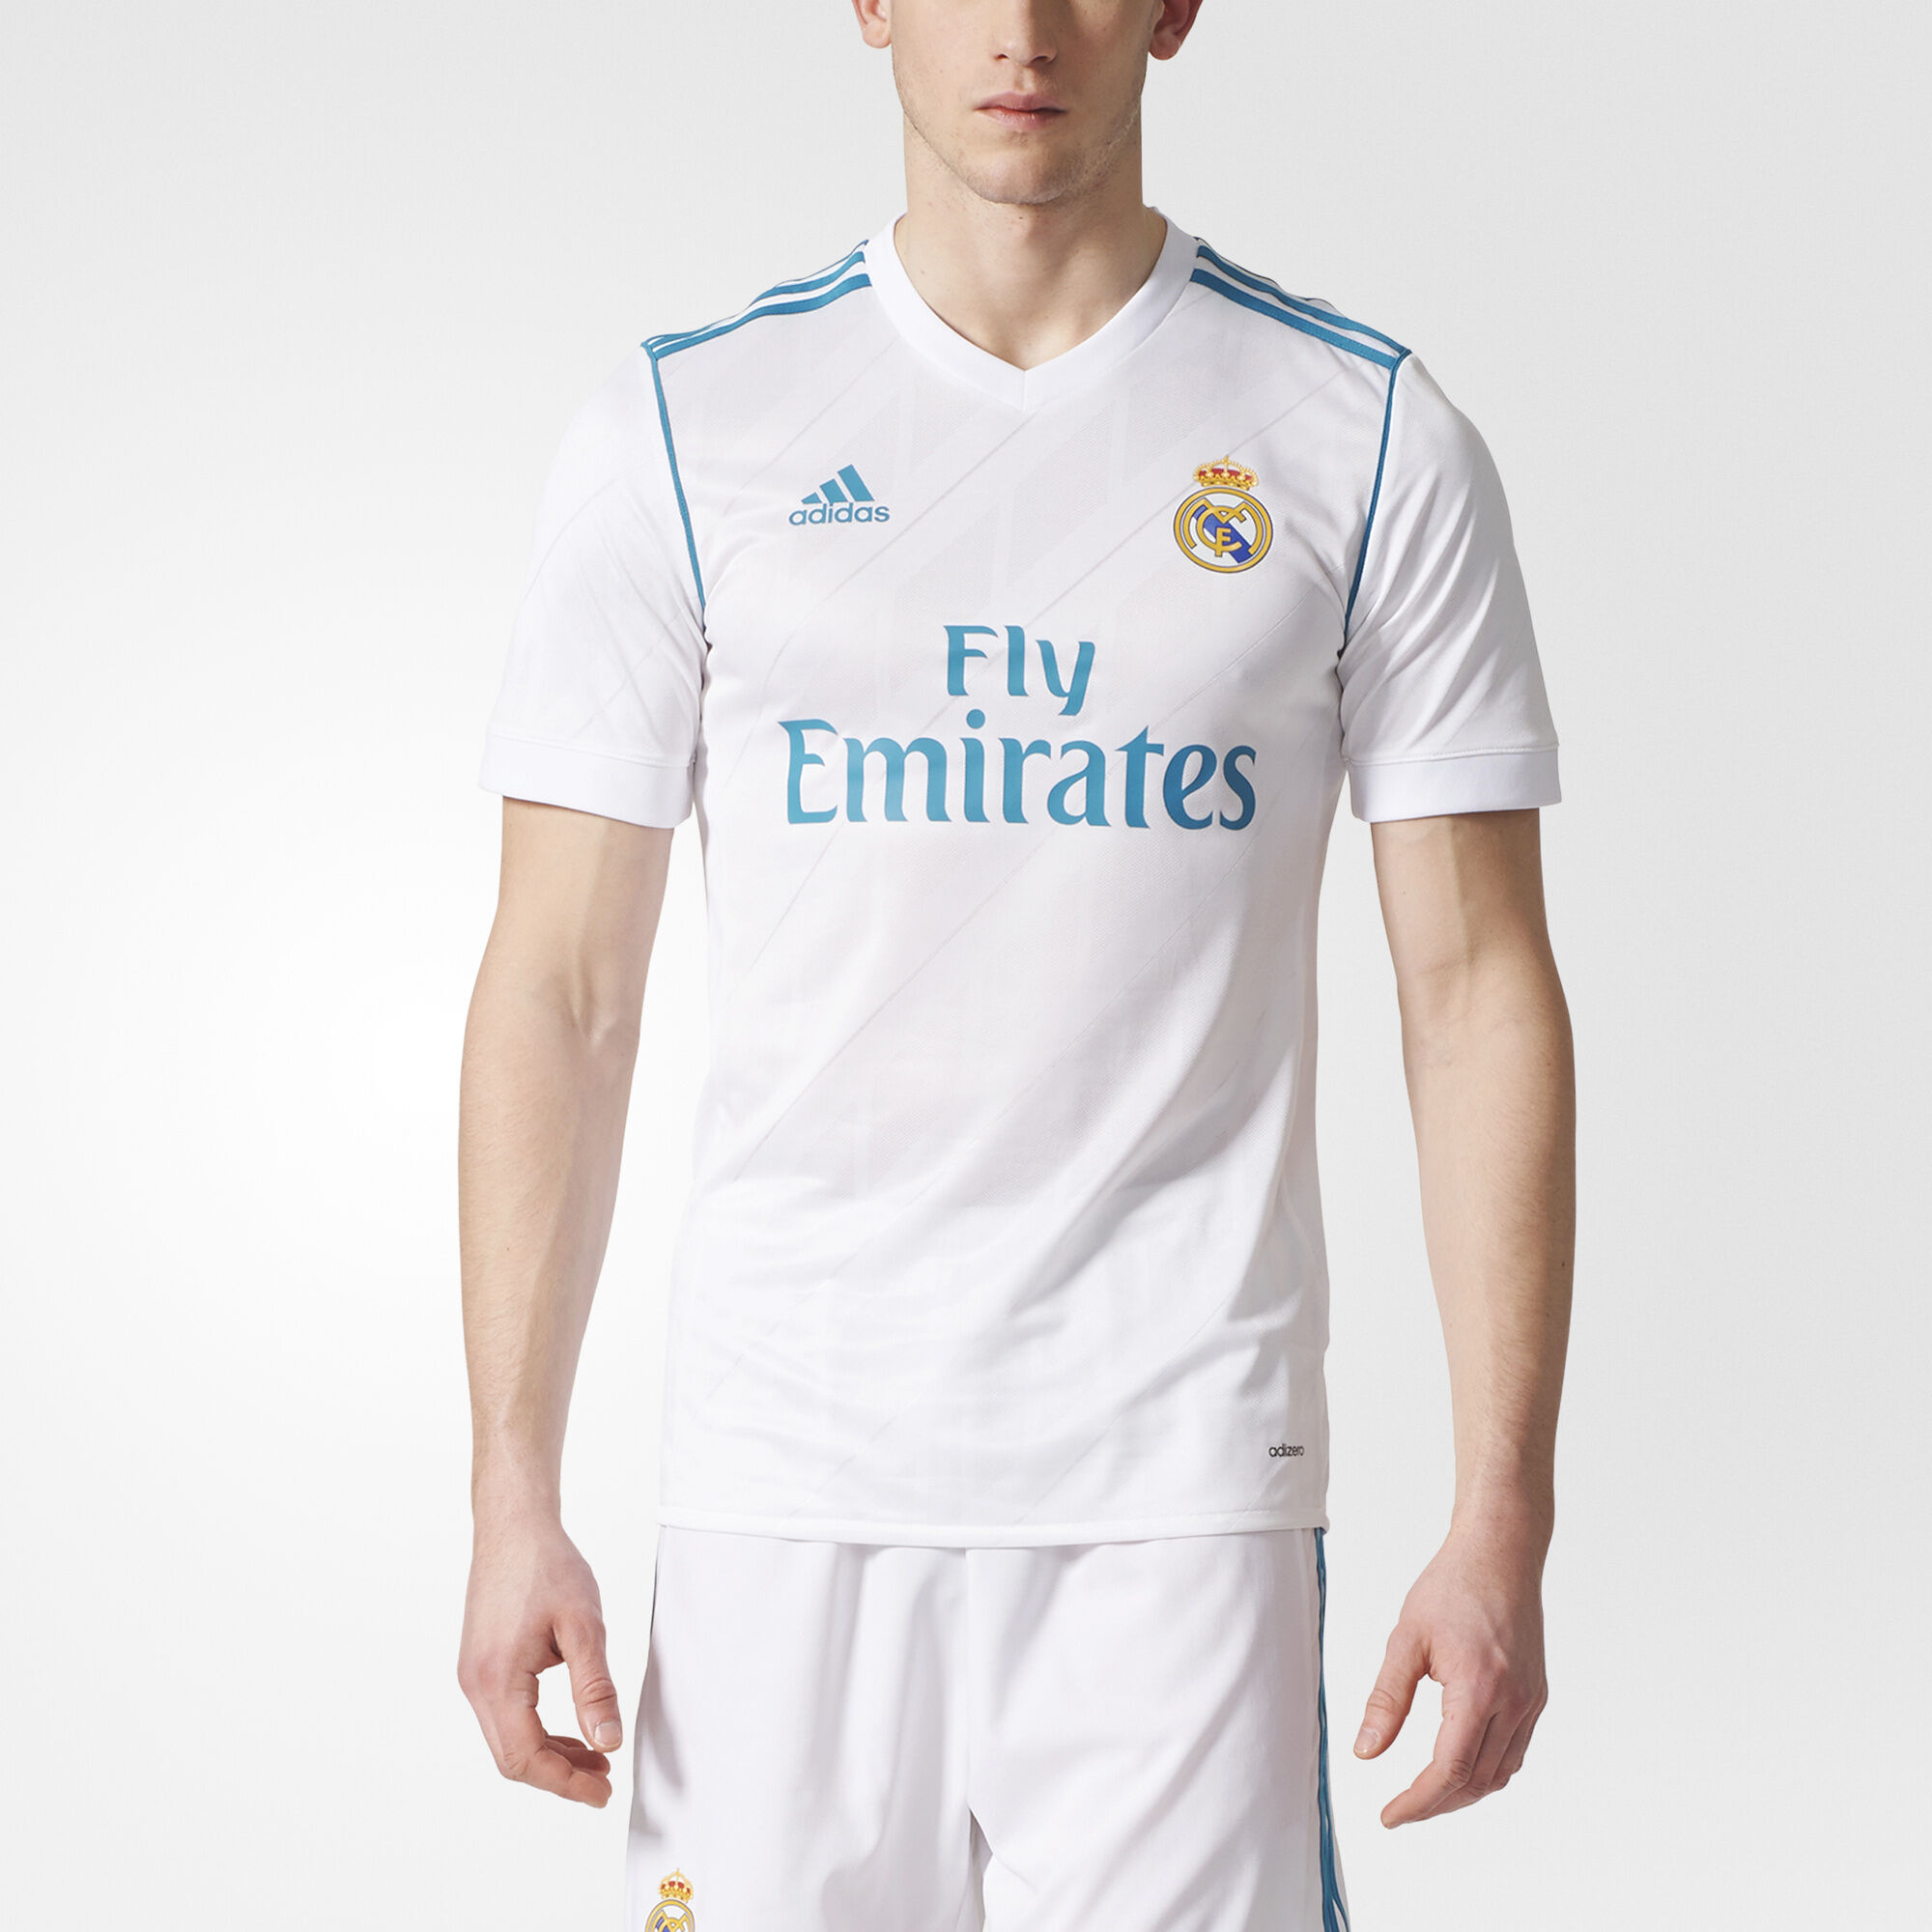 Real Madrid T Shirt Buy Online India - BCD Tofu House 217bb93b3